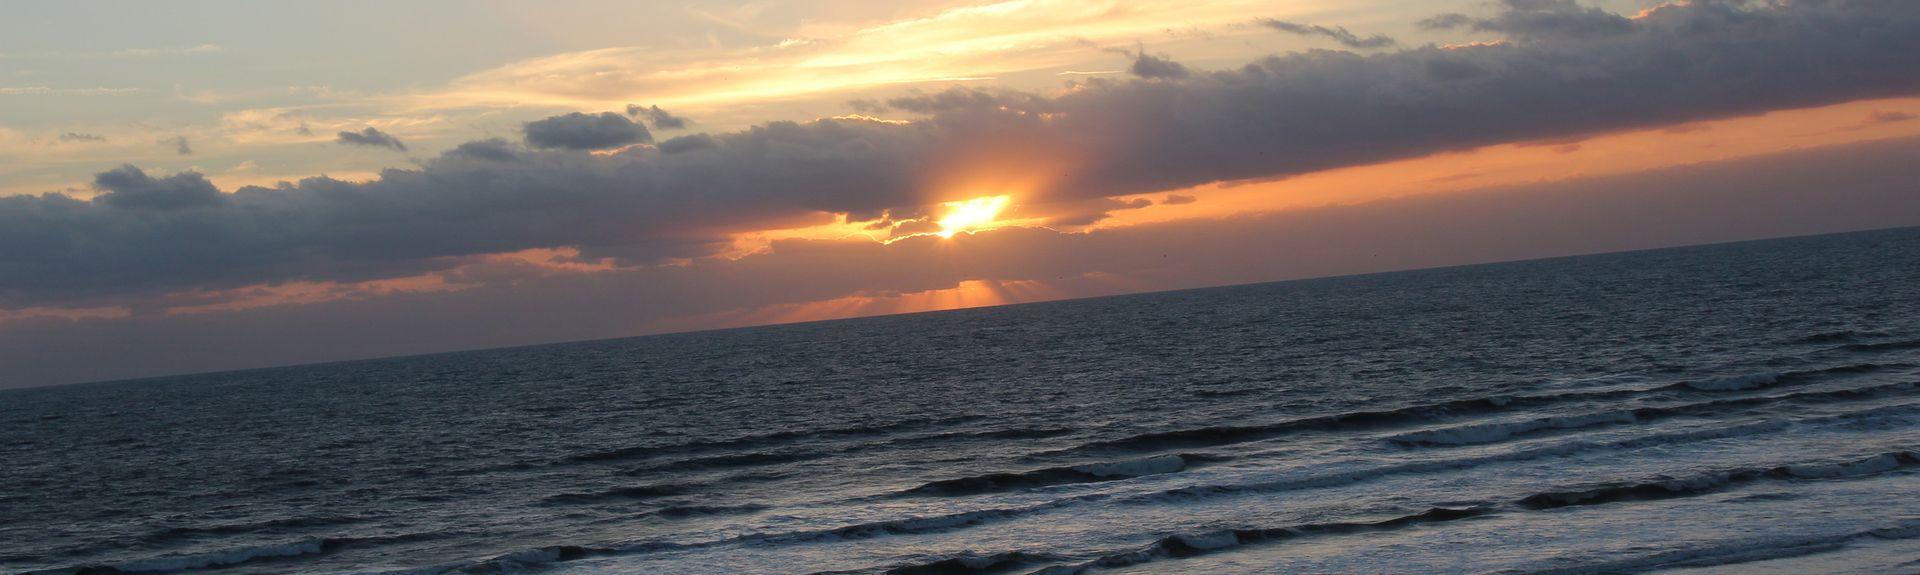 Sandcastles, Cocoa Beach, Florida, United States of America